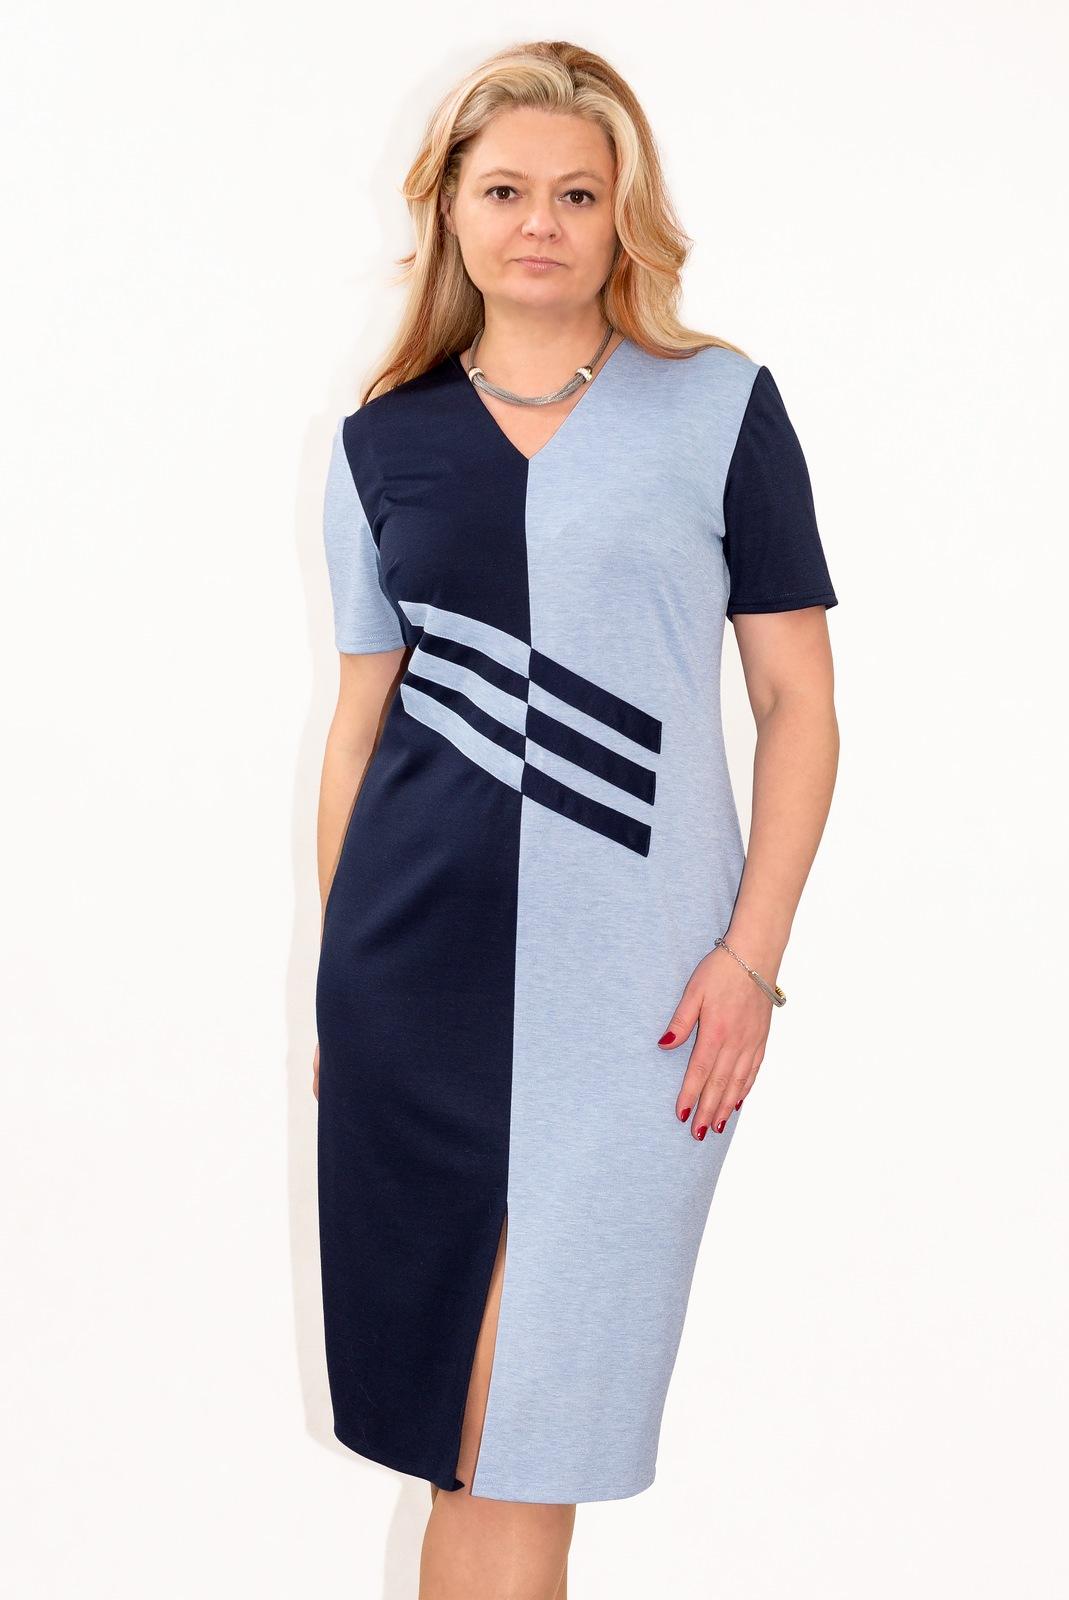 a0a3475eca Elegancka sukienka PLUS SIZE r.50 DO BIURA - 7328889317 - oficjalne ...